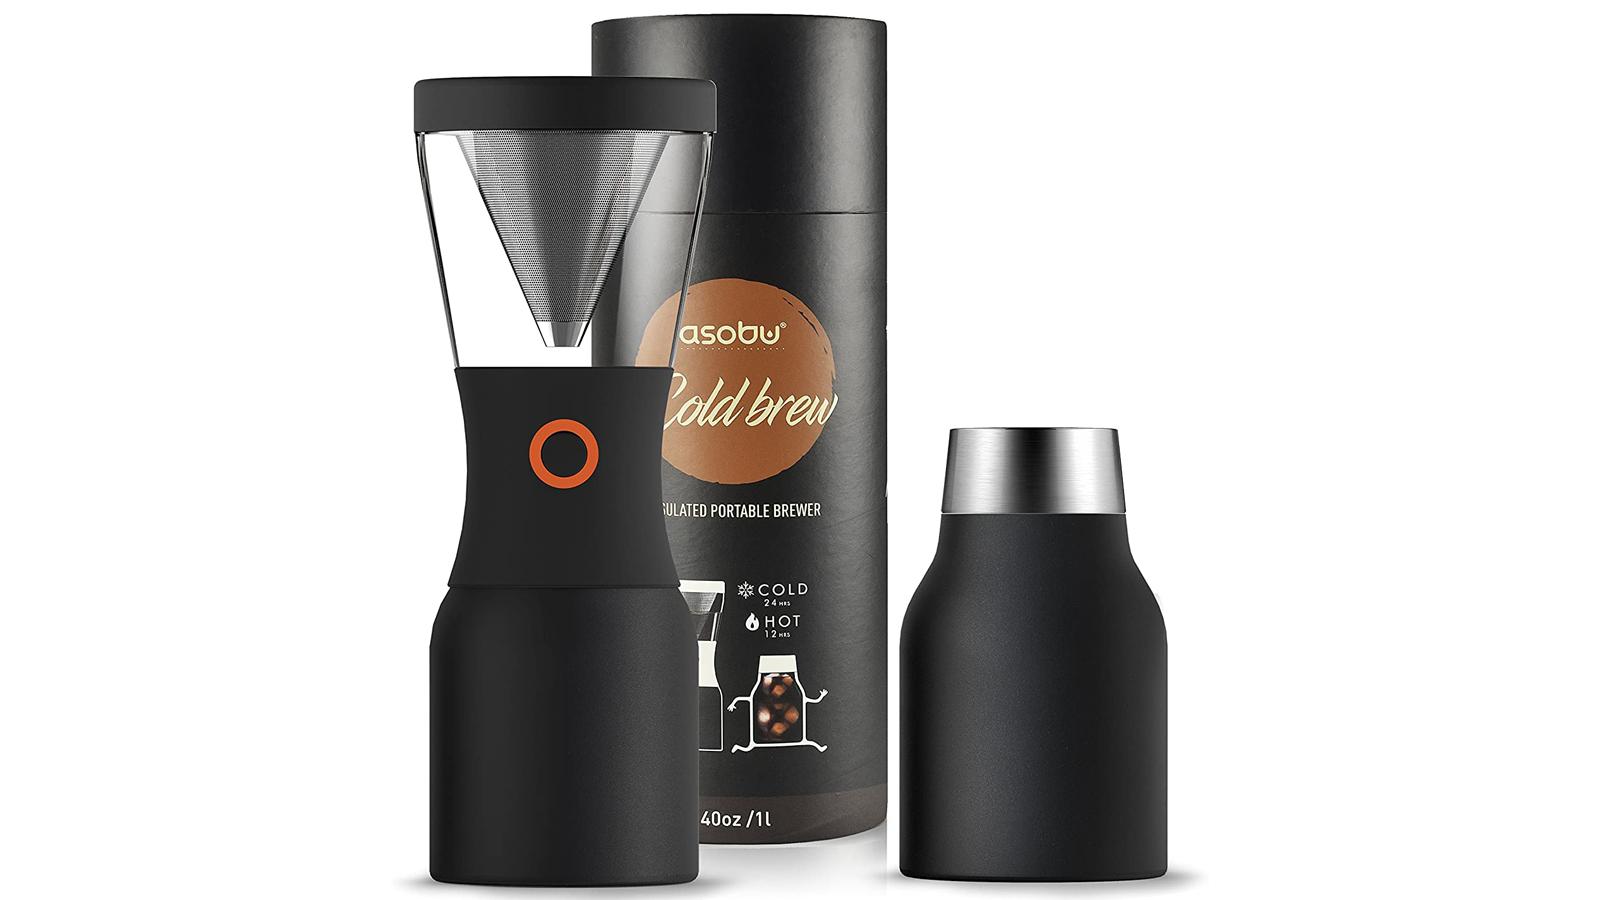 Asobu Coldbrew best portable cold brew coffee maker